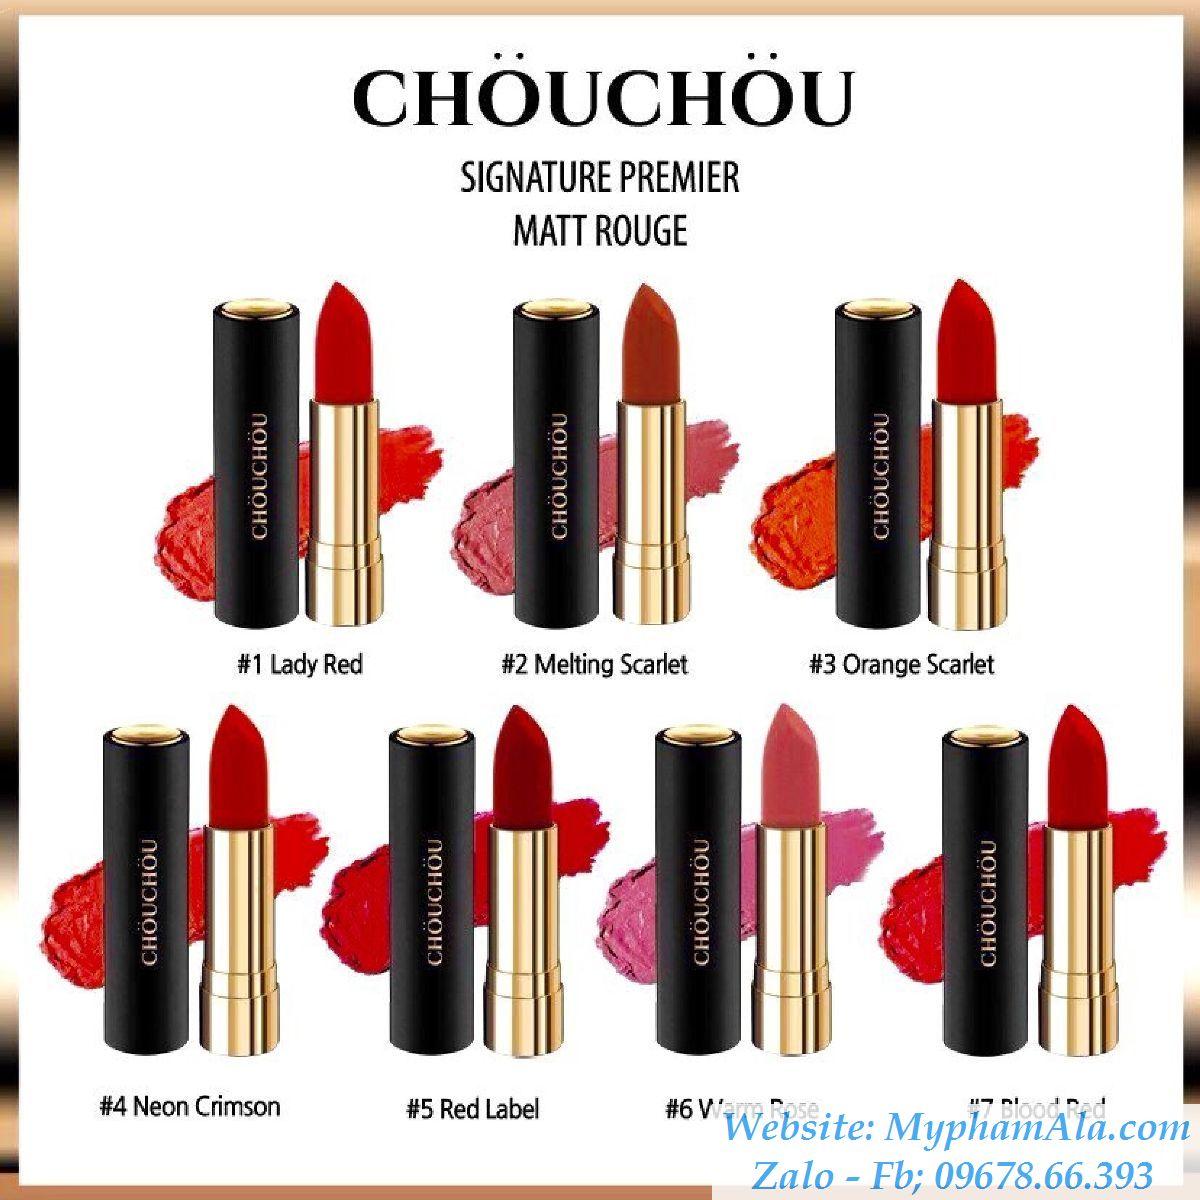 son-chou-chou-signature-premier-matt-rouge_master_result